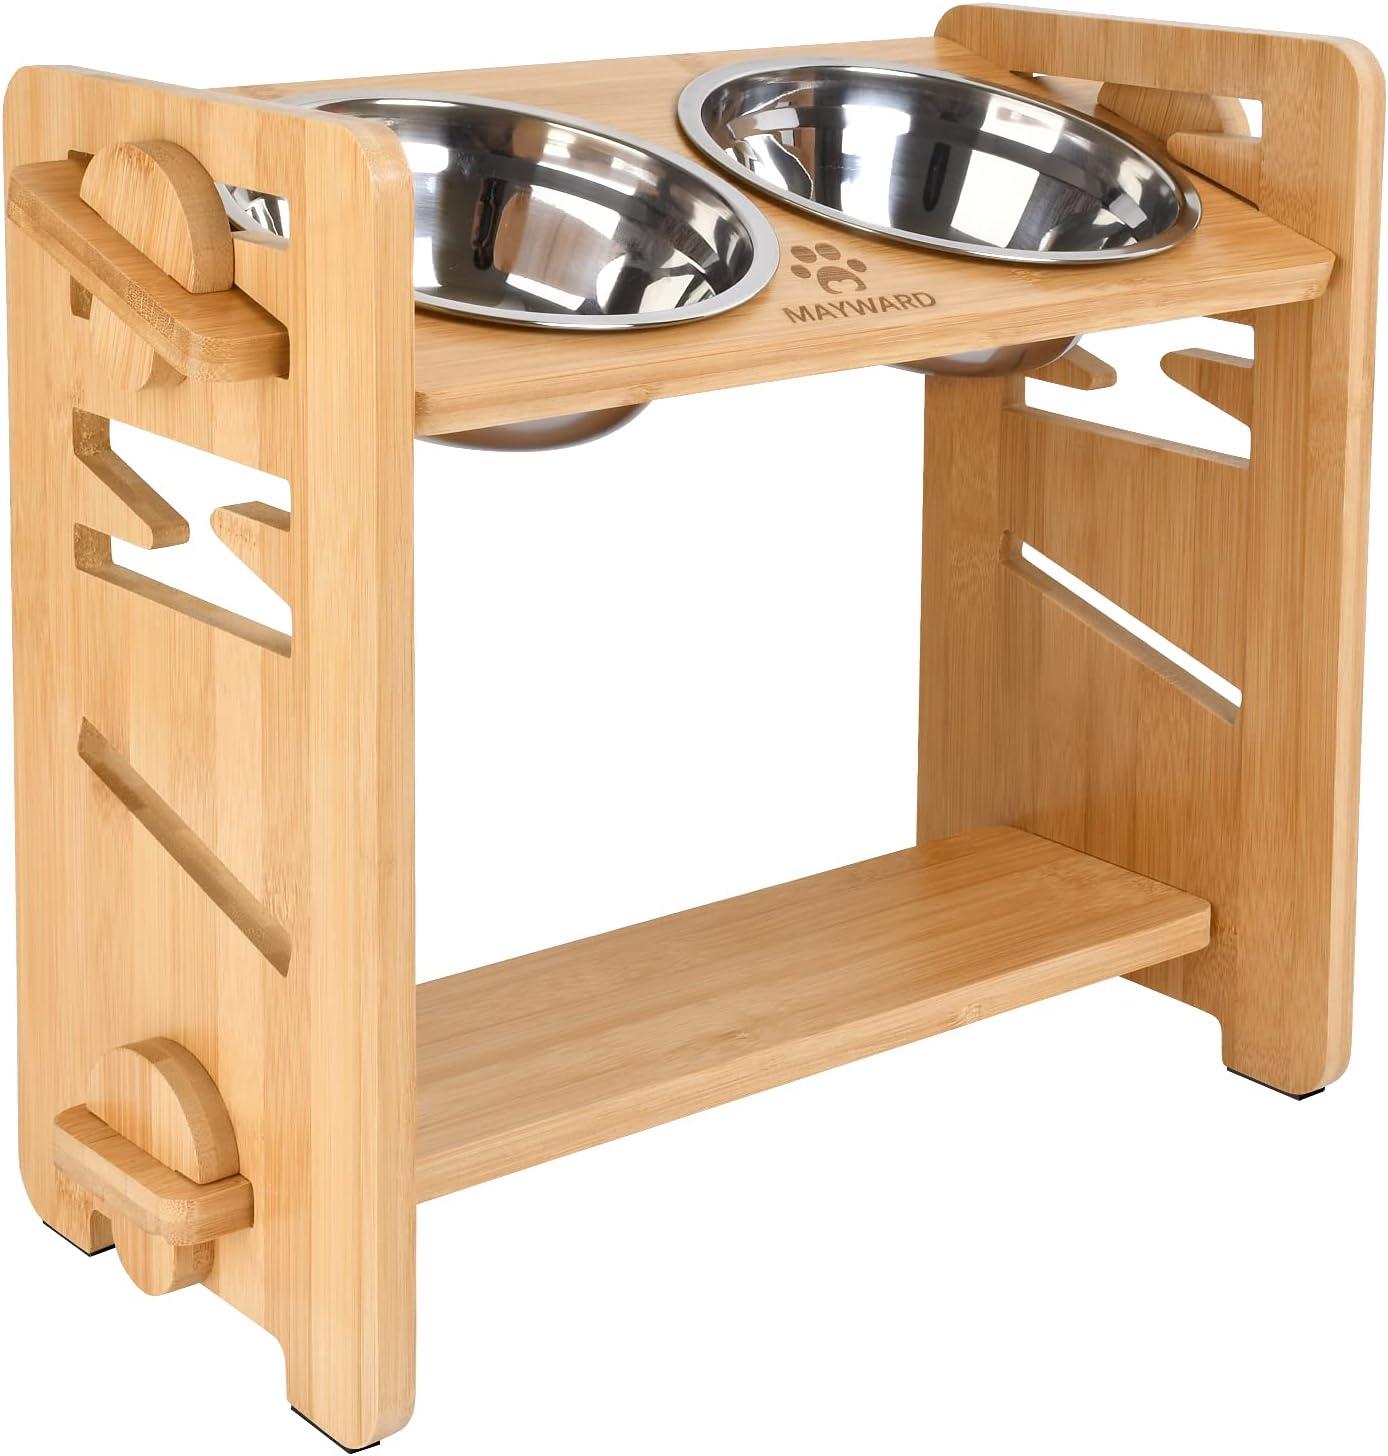 MAYWARD Dog Raised Bowls, Adjustable Bamboo Elevated Dog Bowl 15° Tilted and 0° Raised Dog Bowl with 2 Stainless Steel Bowls, Raised Food Bowls for Medium and Small Dogs and Cats